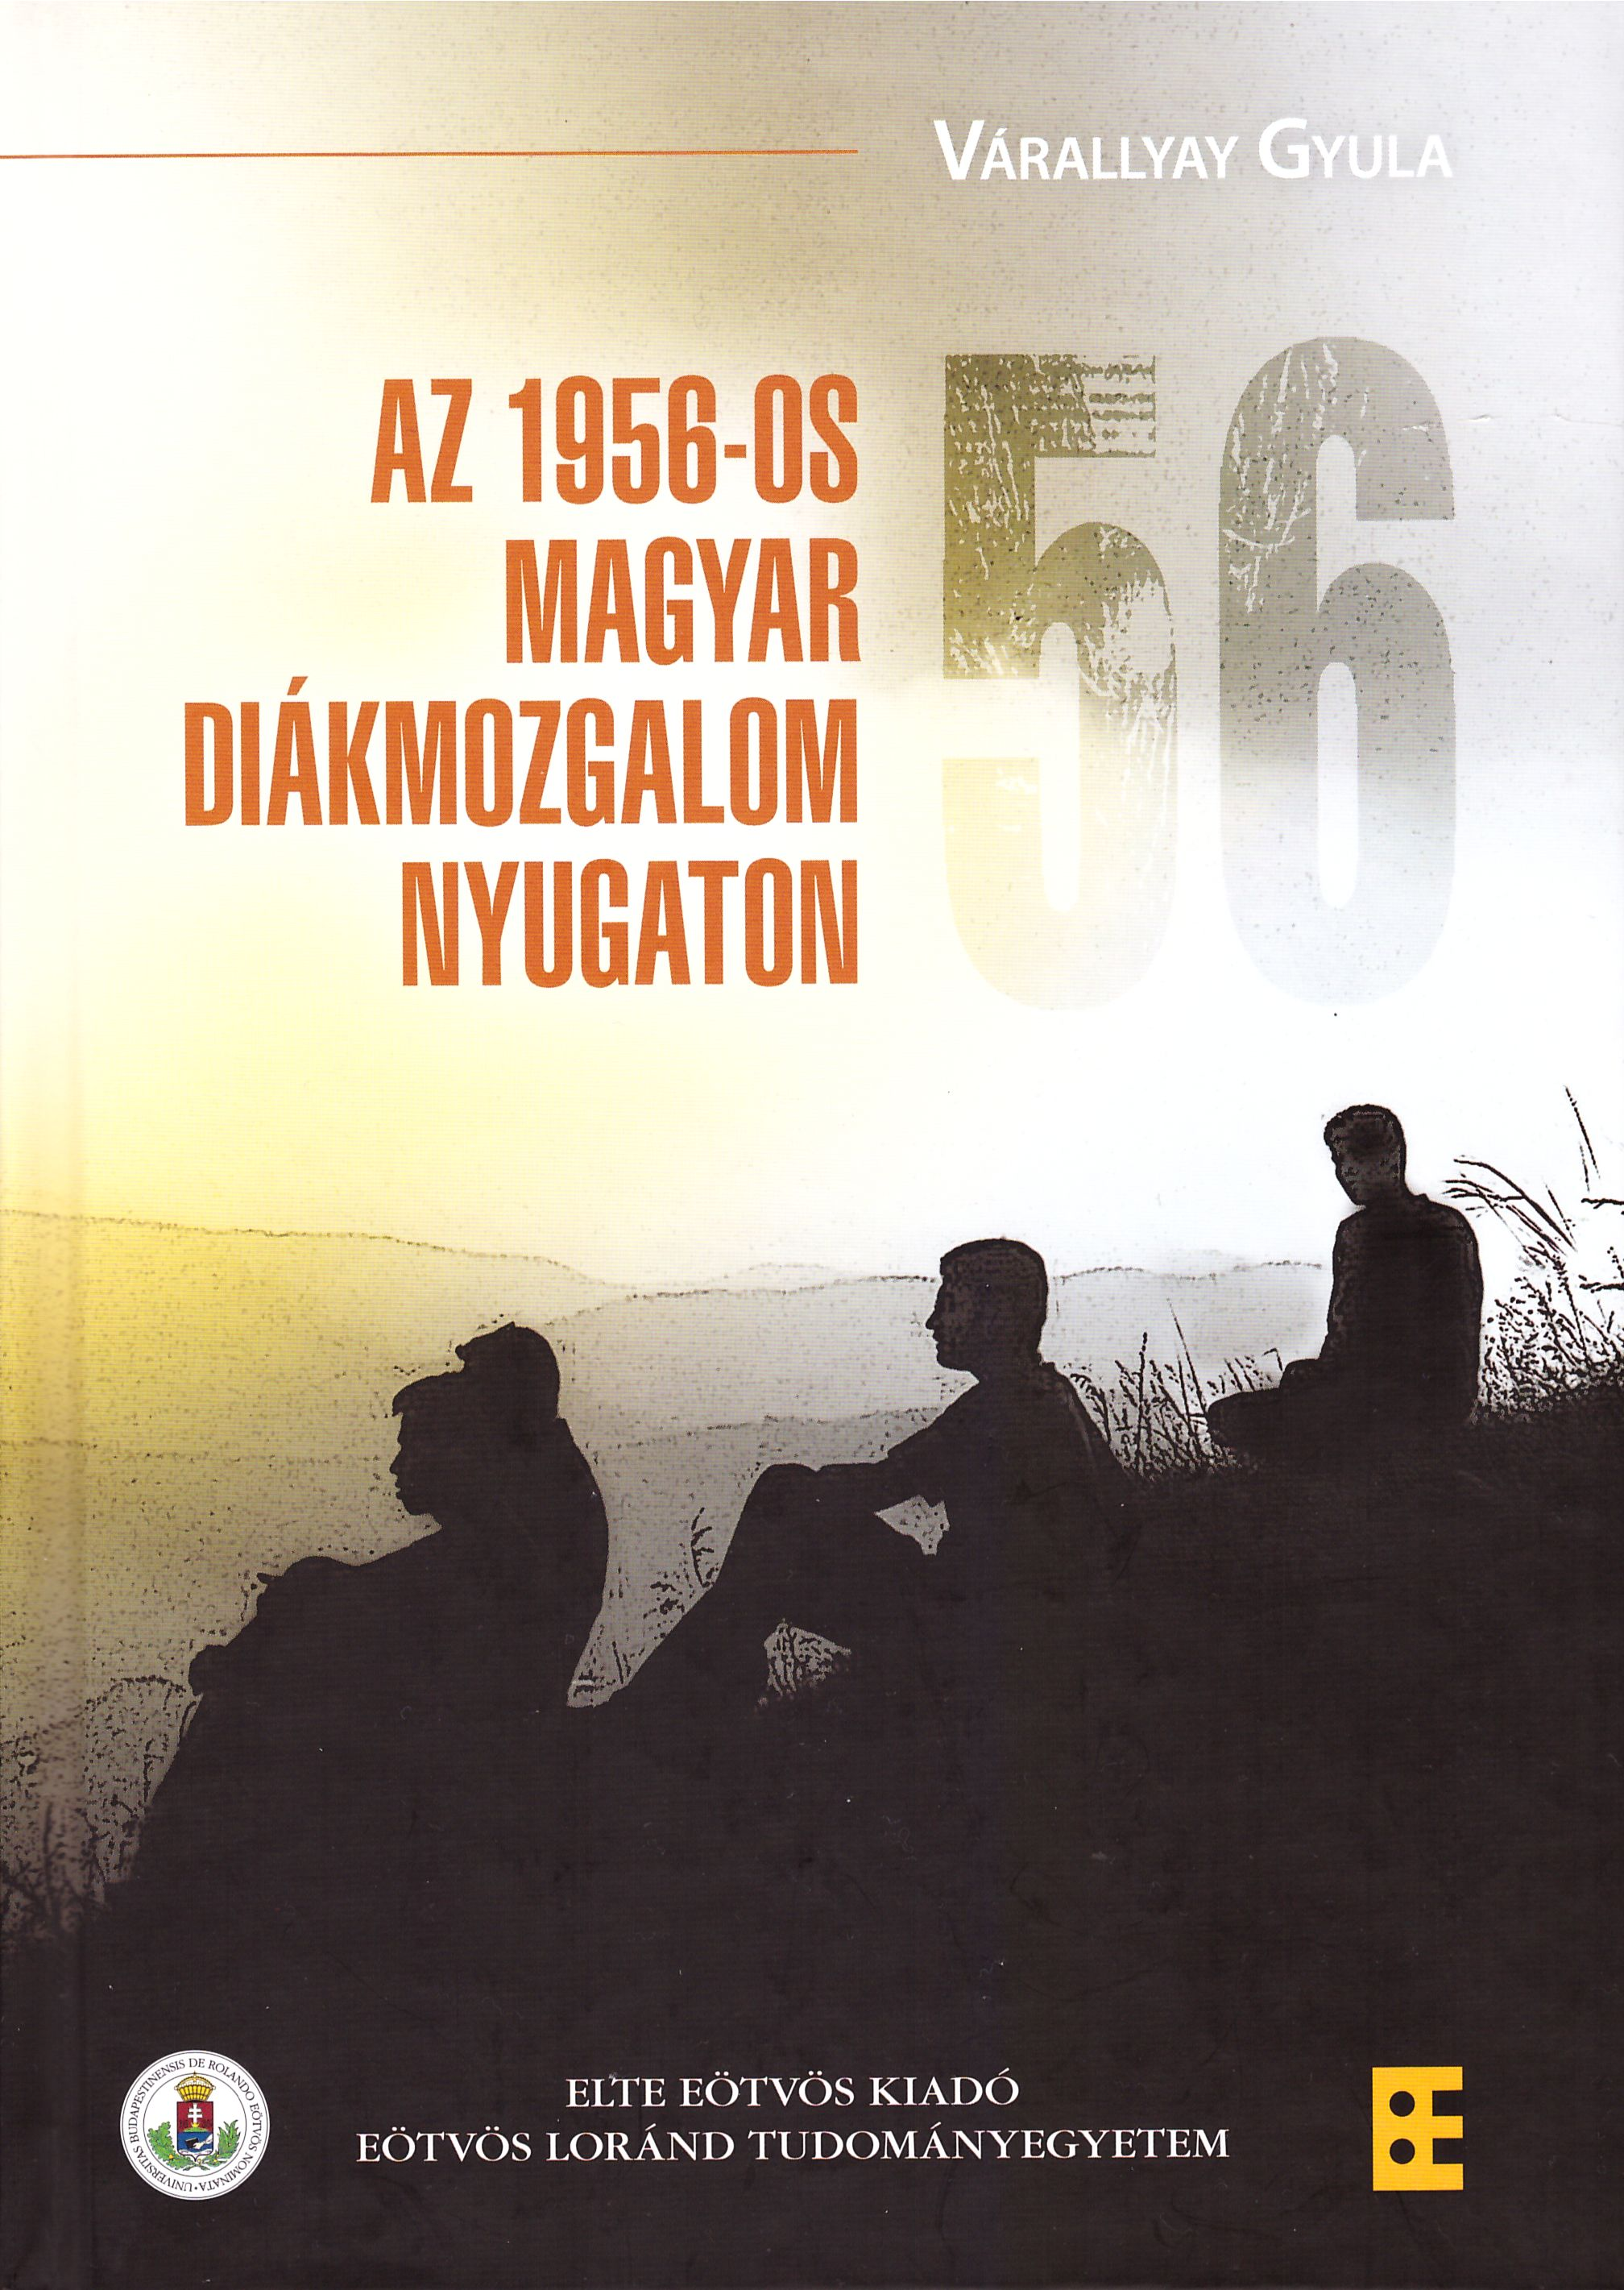 Várallyay, Gyula's monography published on the history of UFHS-MEFESZ 1957-1967 - second edition, ELTE Eötvös Publisher, Budapest 2016